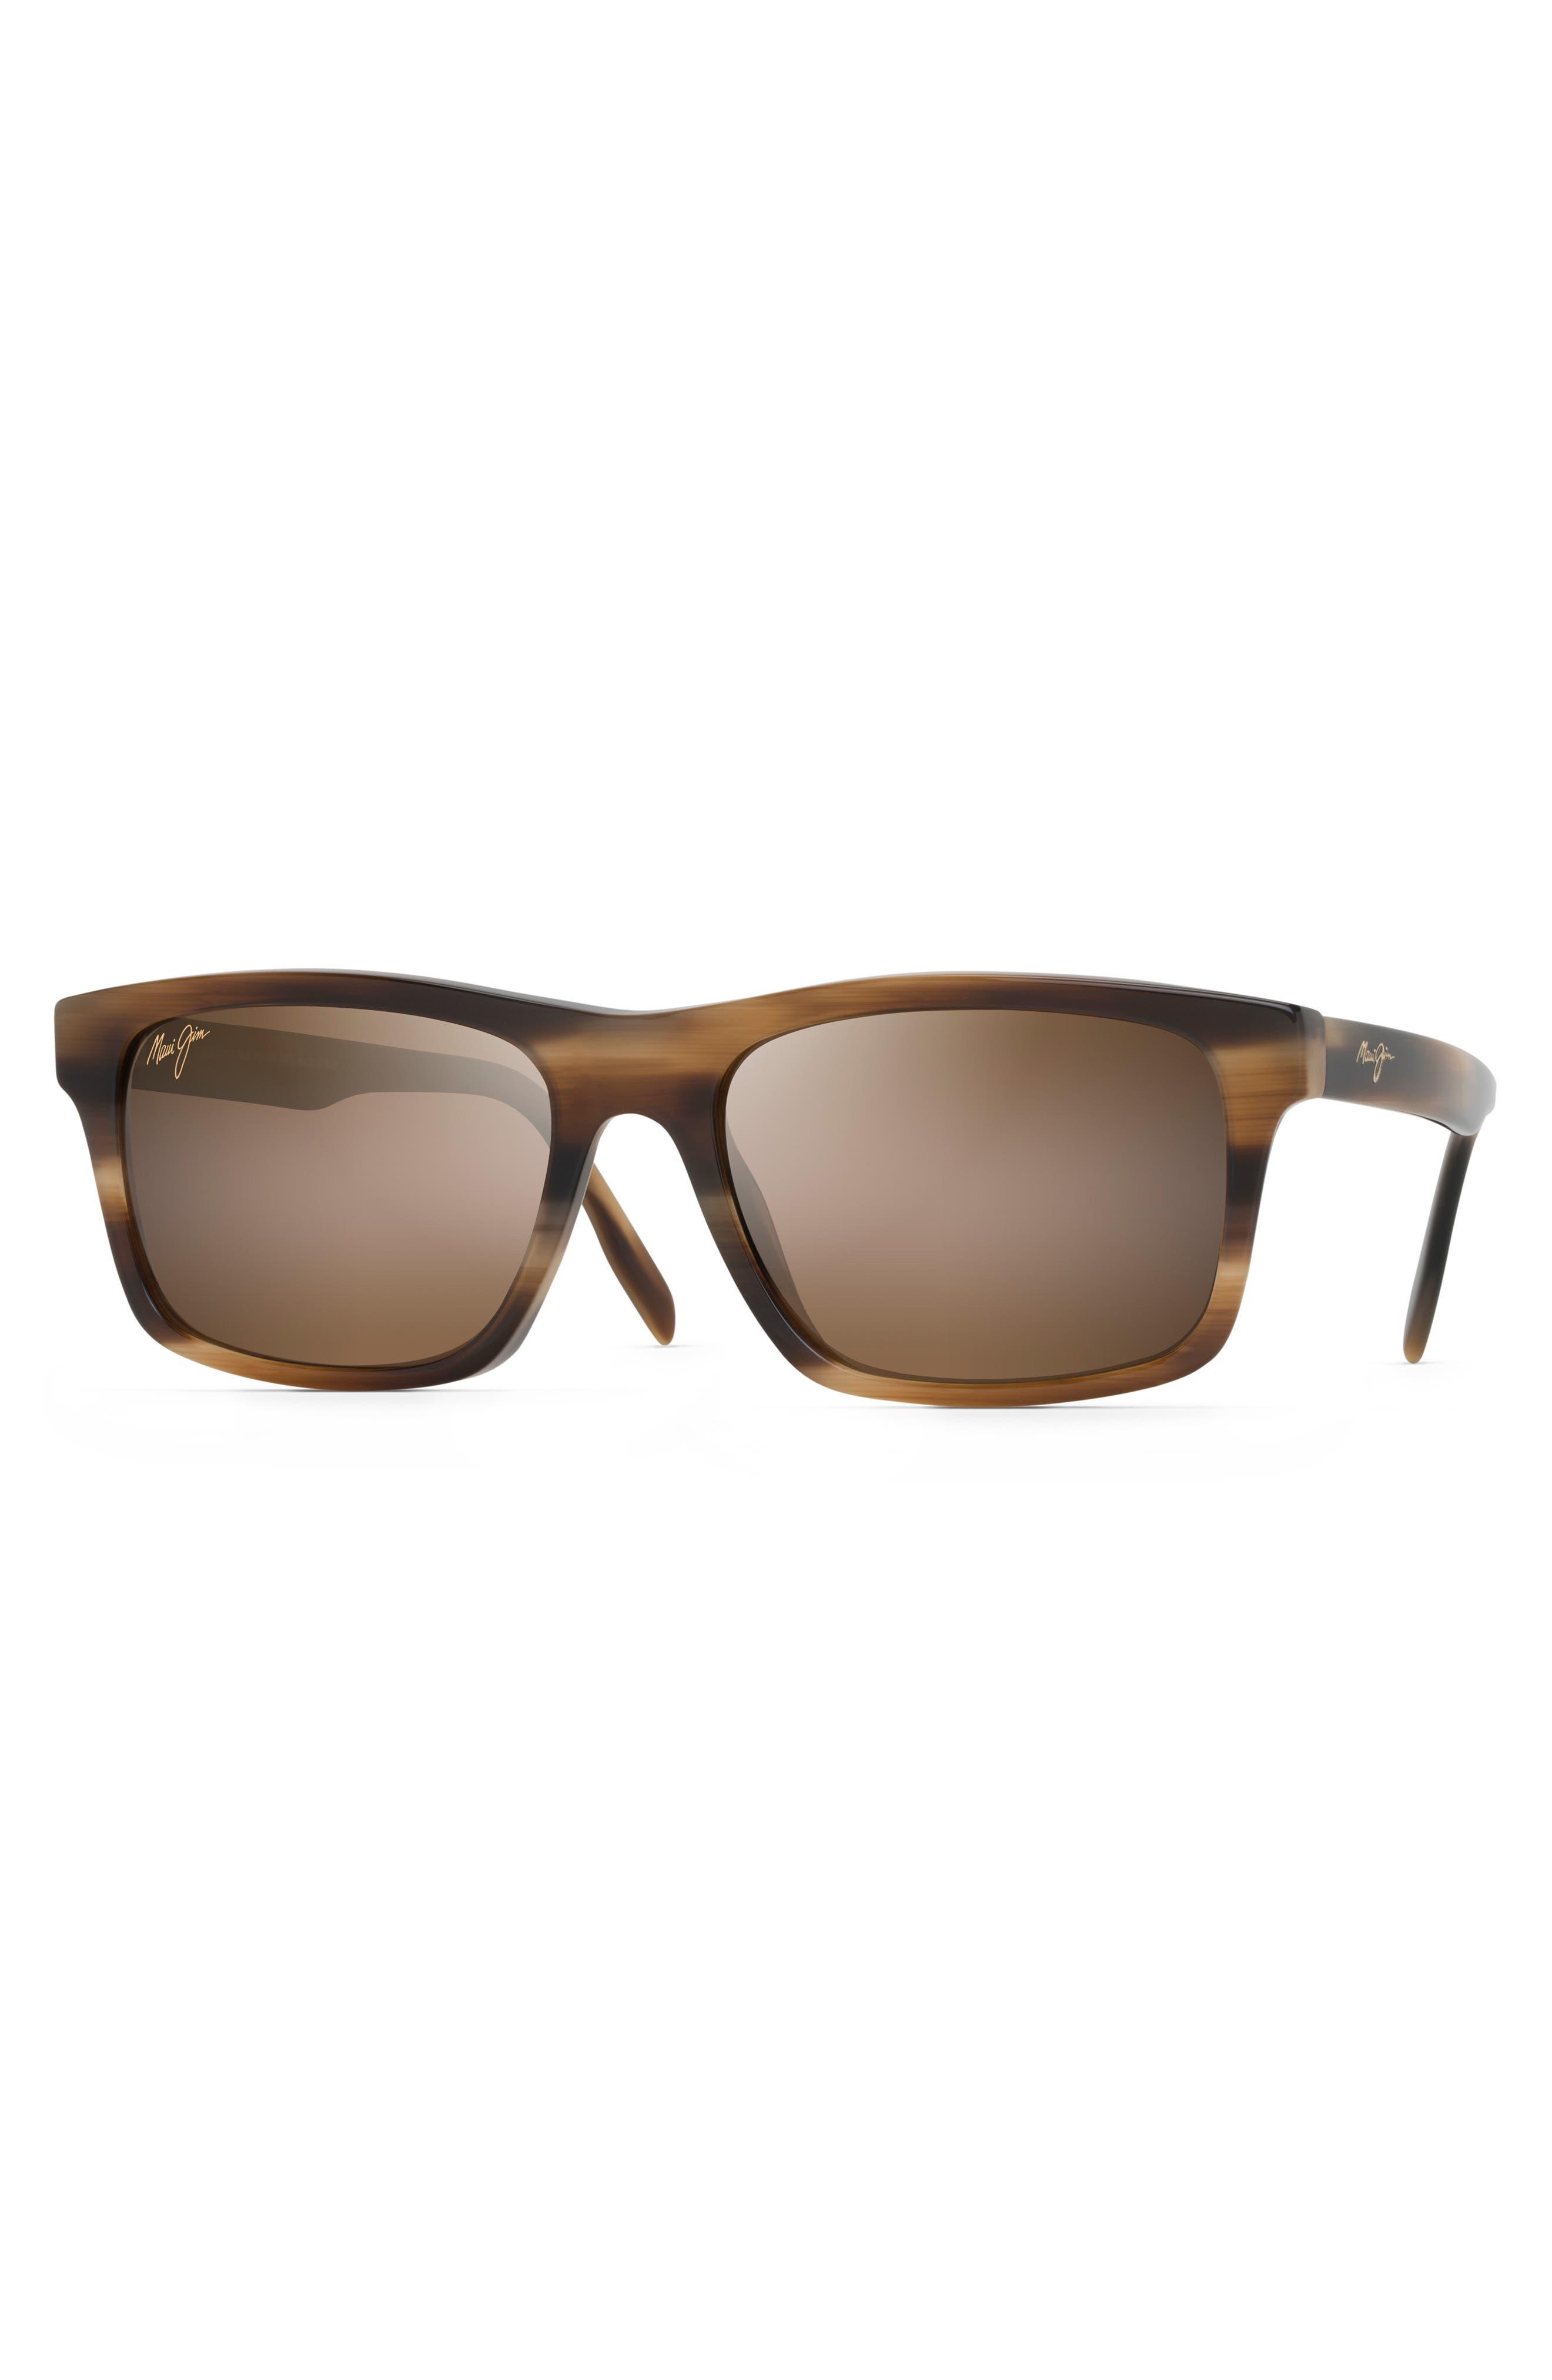 Waipio Valley 57mm Polarized Sunglasses